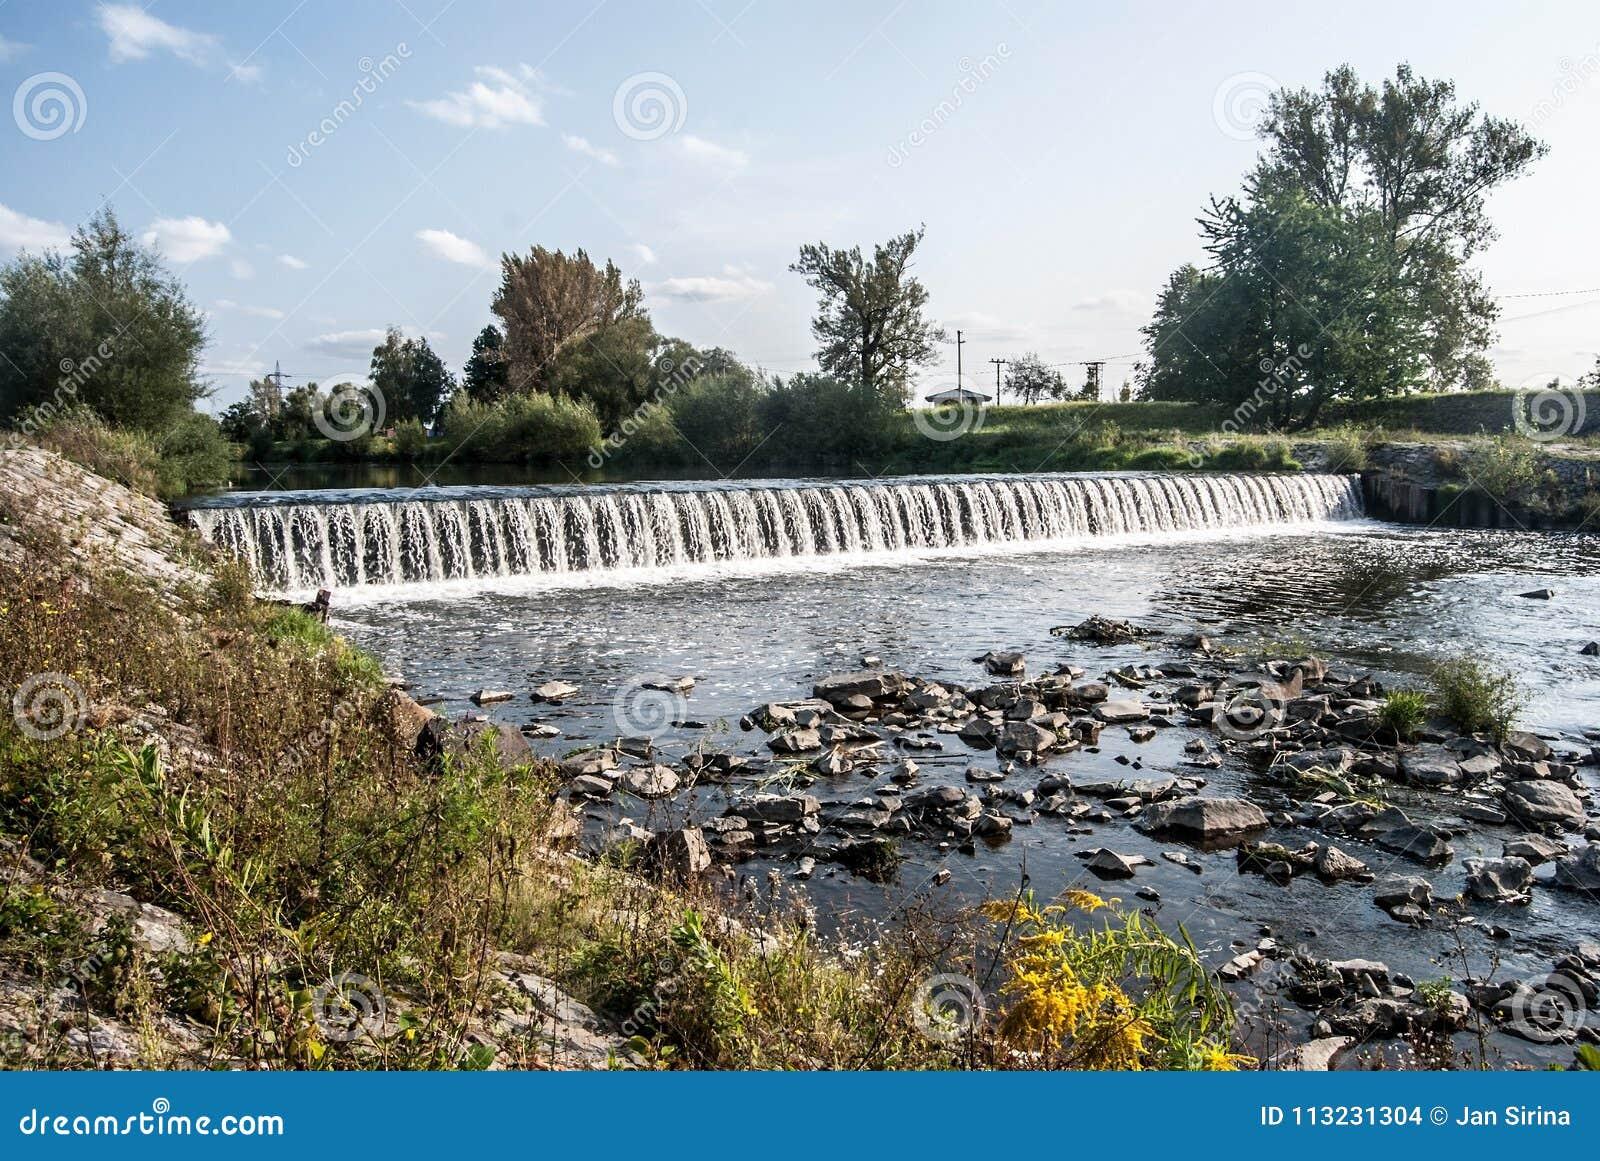 Плотина на реке Olse в городе Karvina в чехии